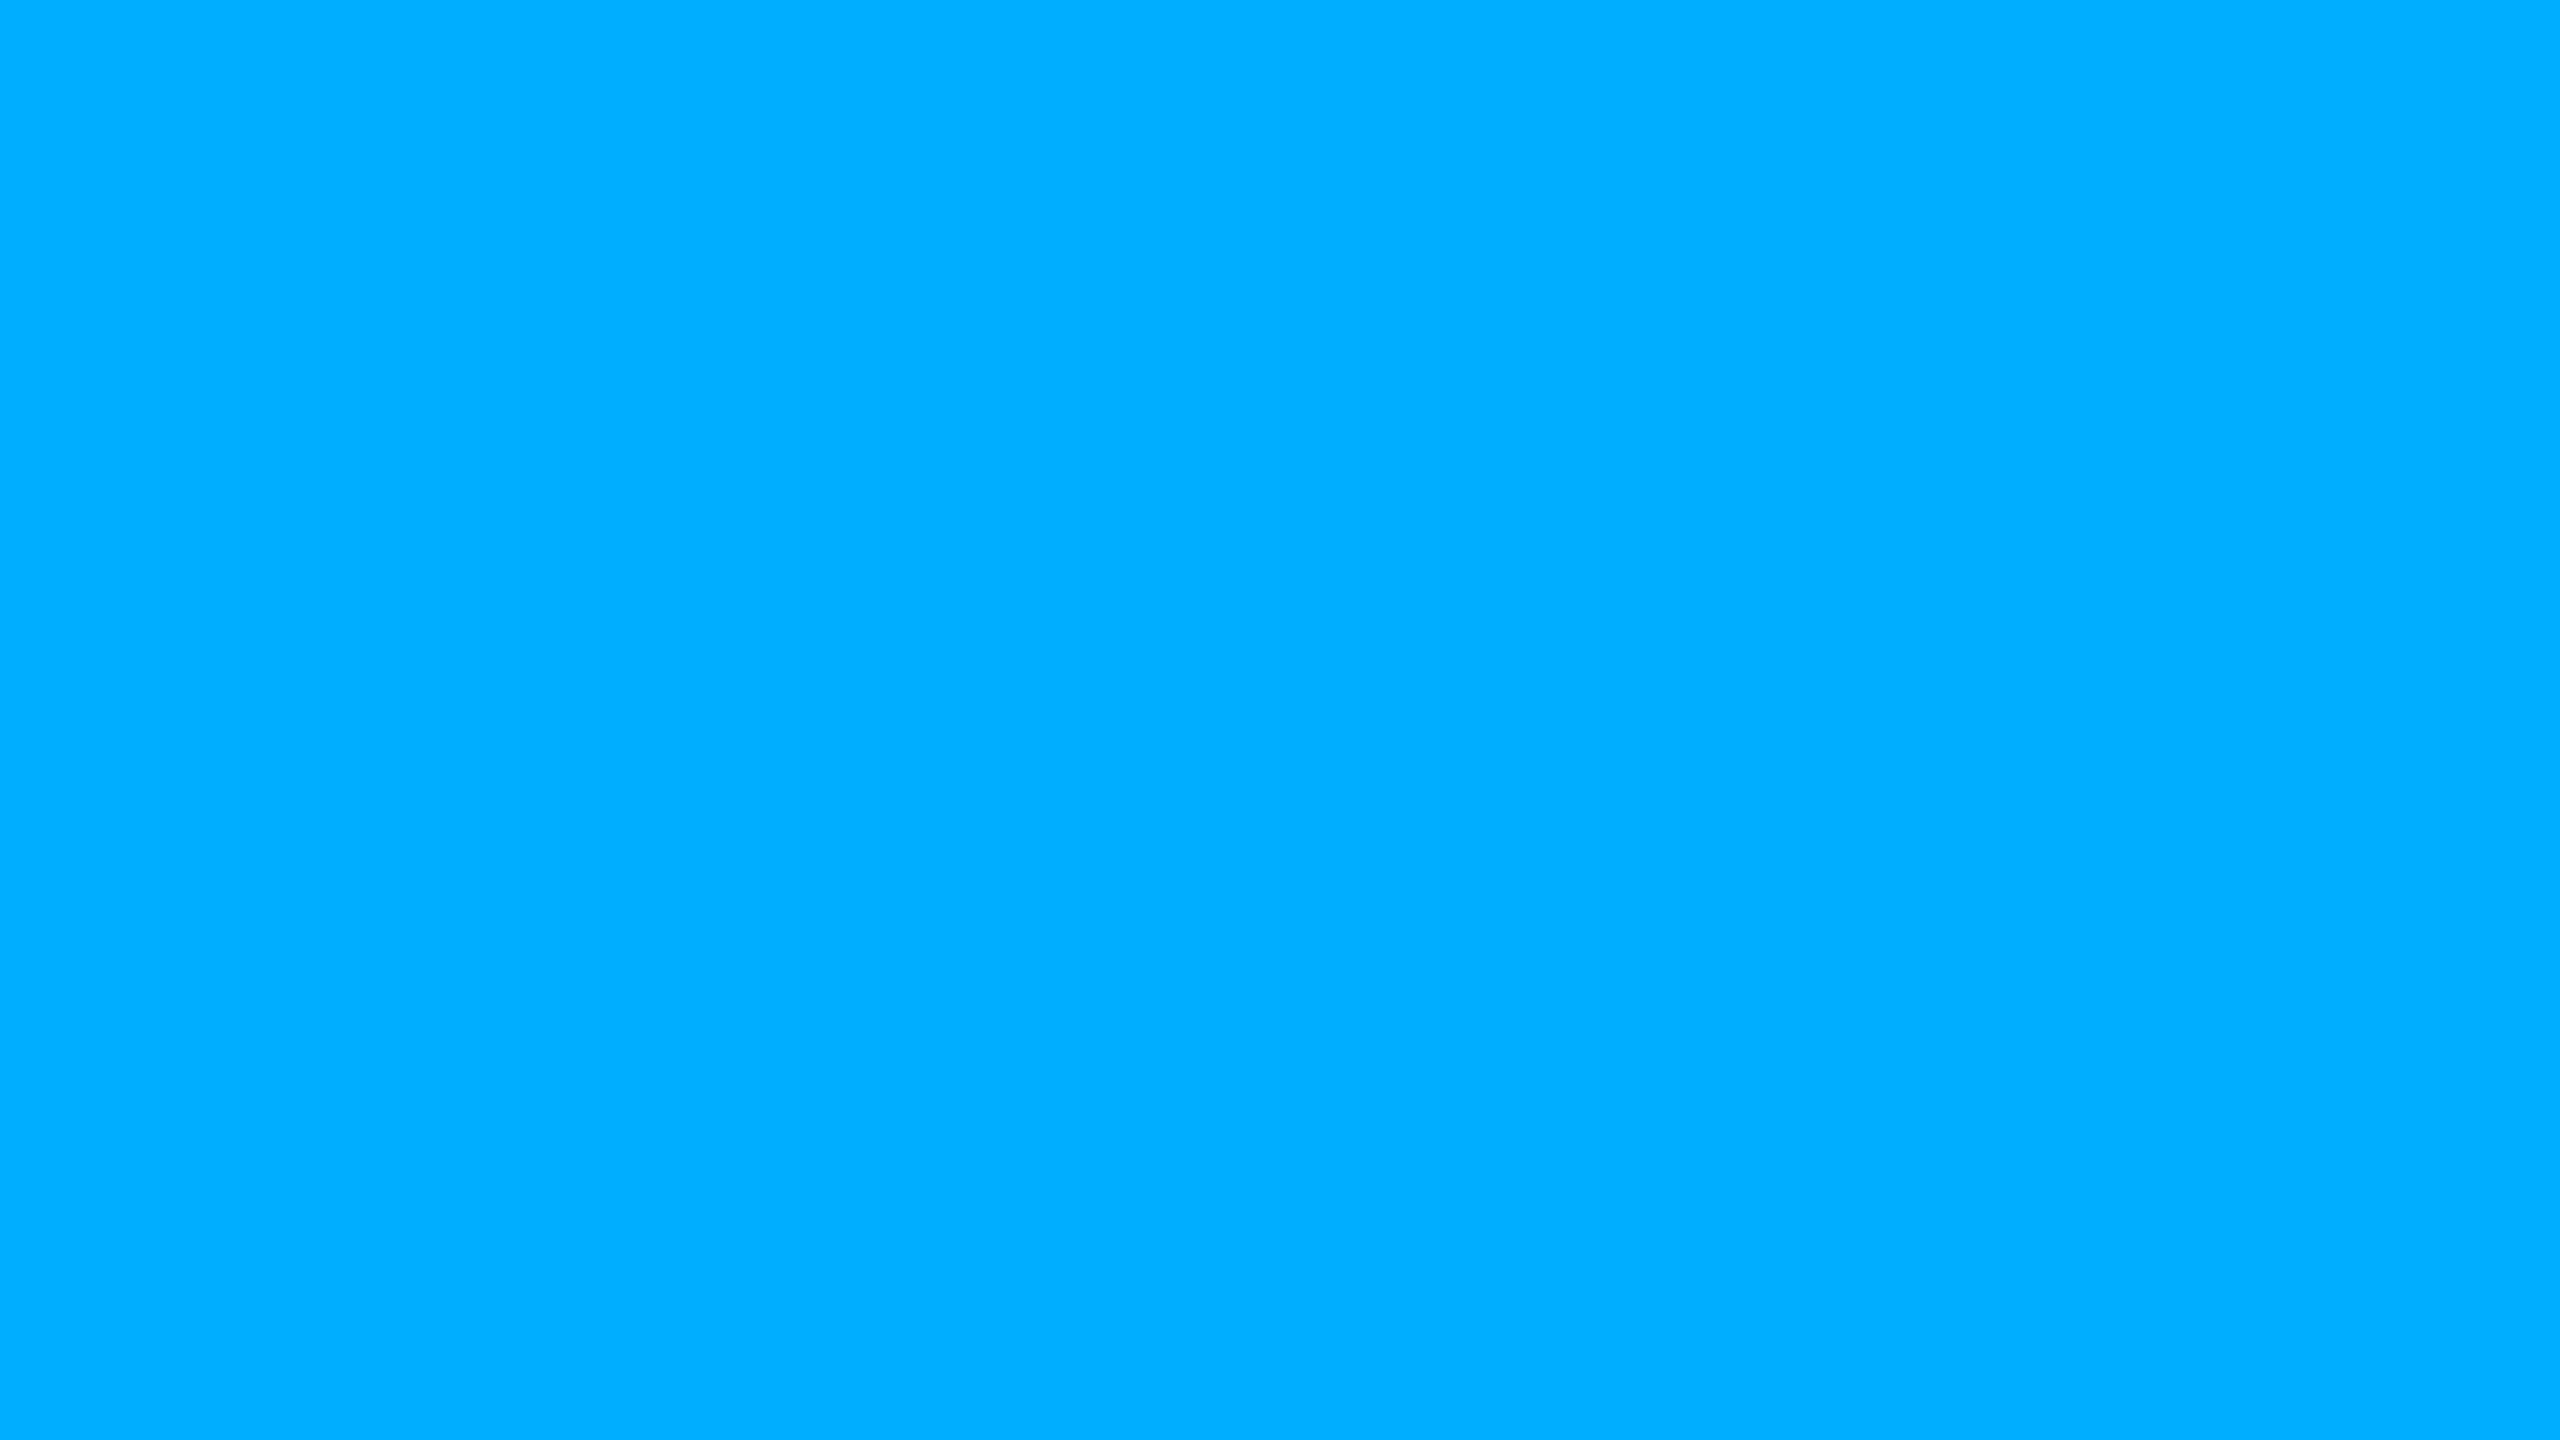 hinh nen mau xanh 42